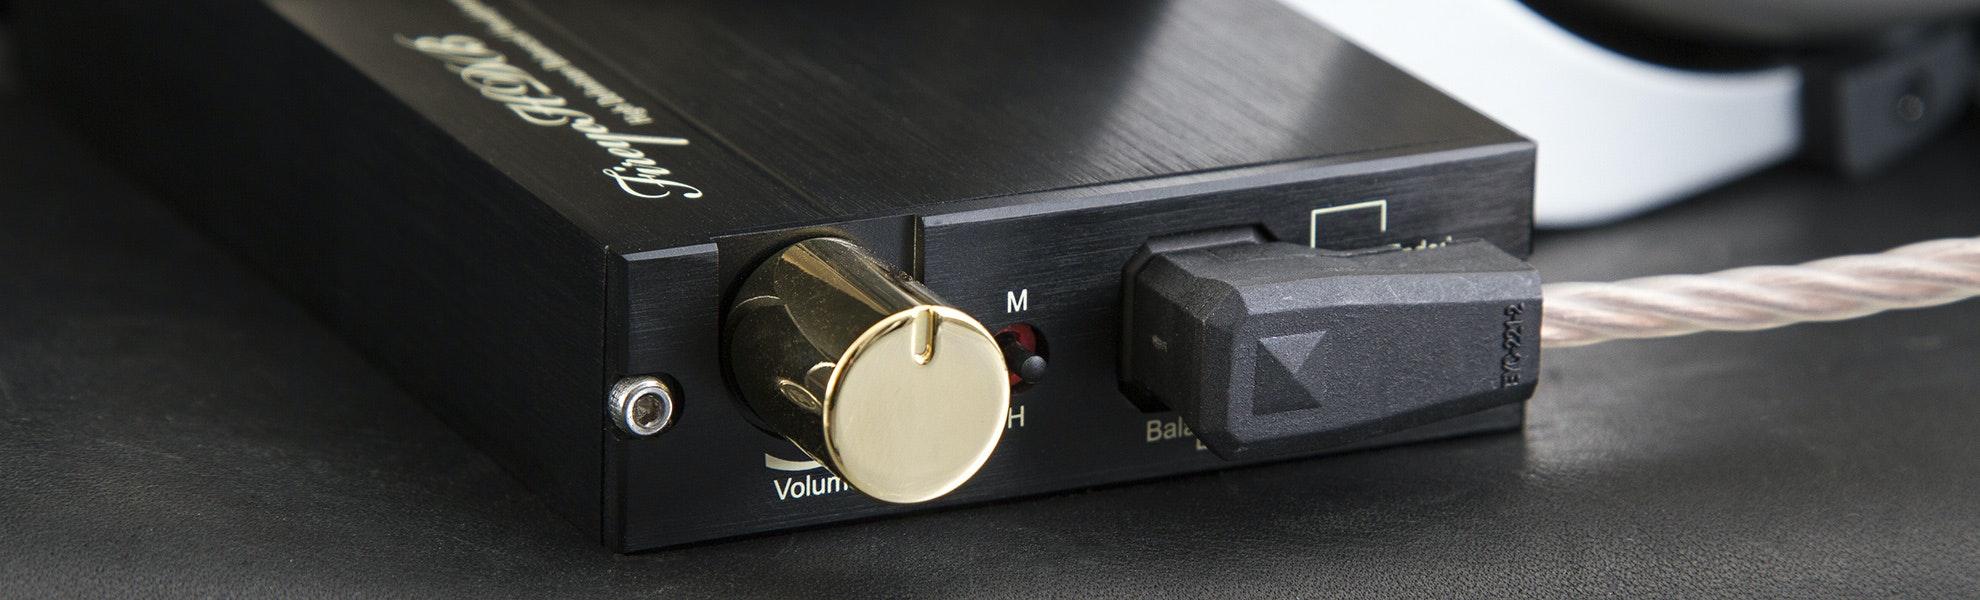 Fireye HDB Balanced Portable Amplifier